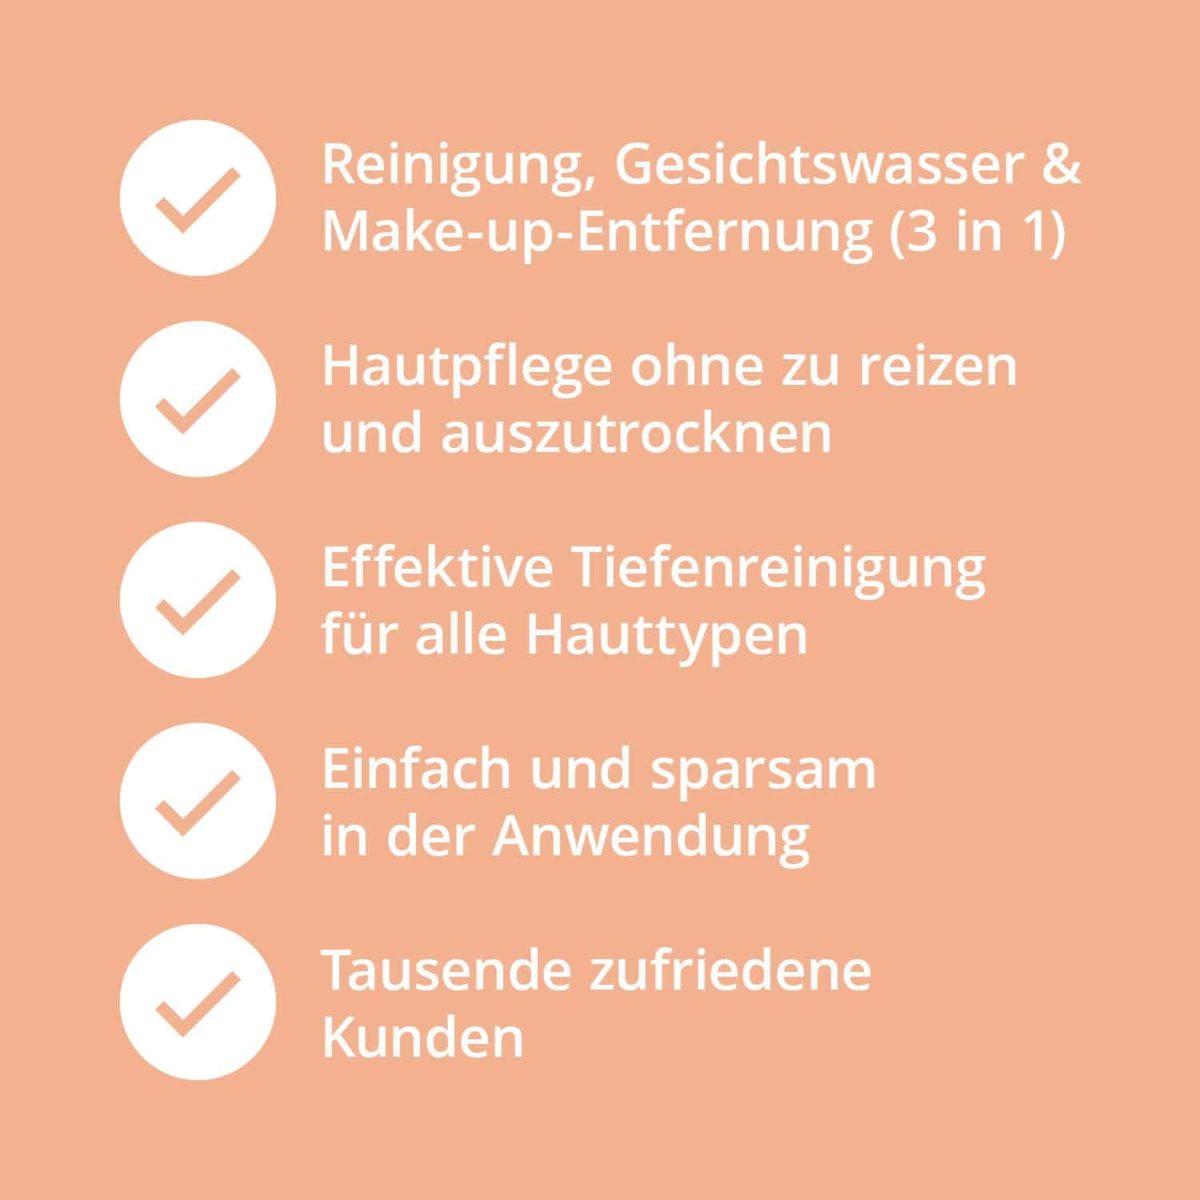 Casida Mizellenwasser Kamille Natural – 150 ml 15408238 PZN Apotheke Abschminken Make-up pflanzlich9